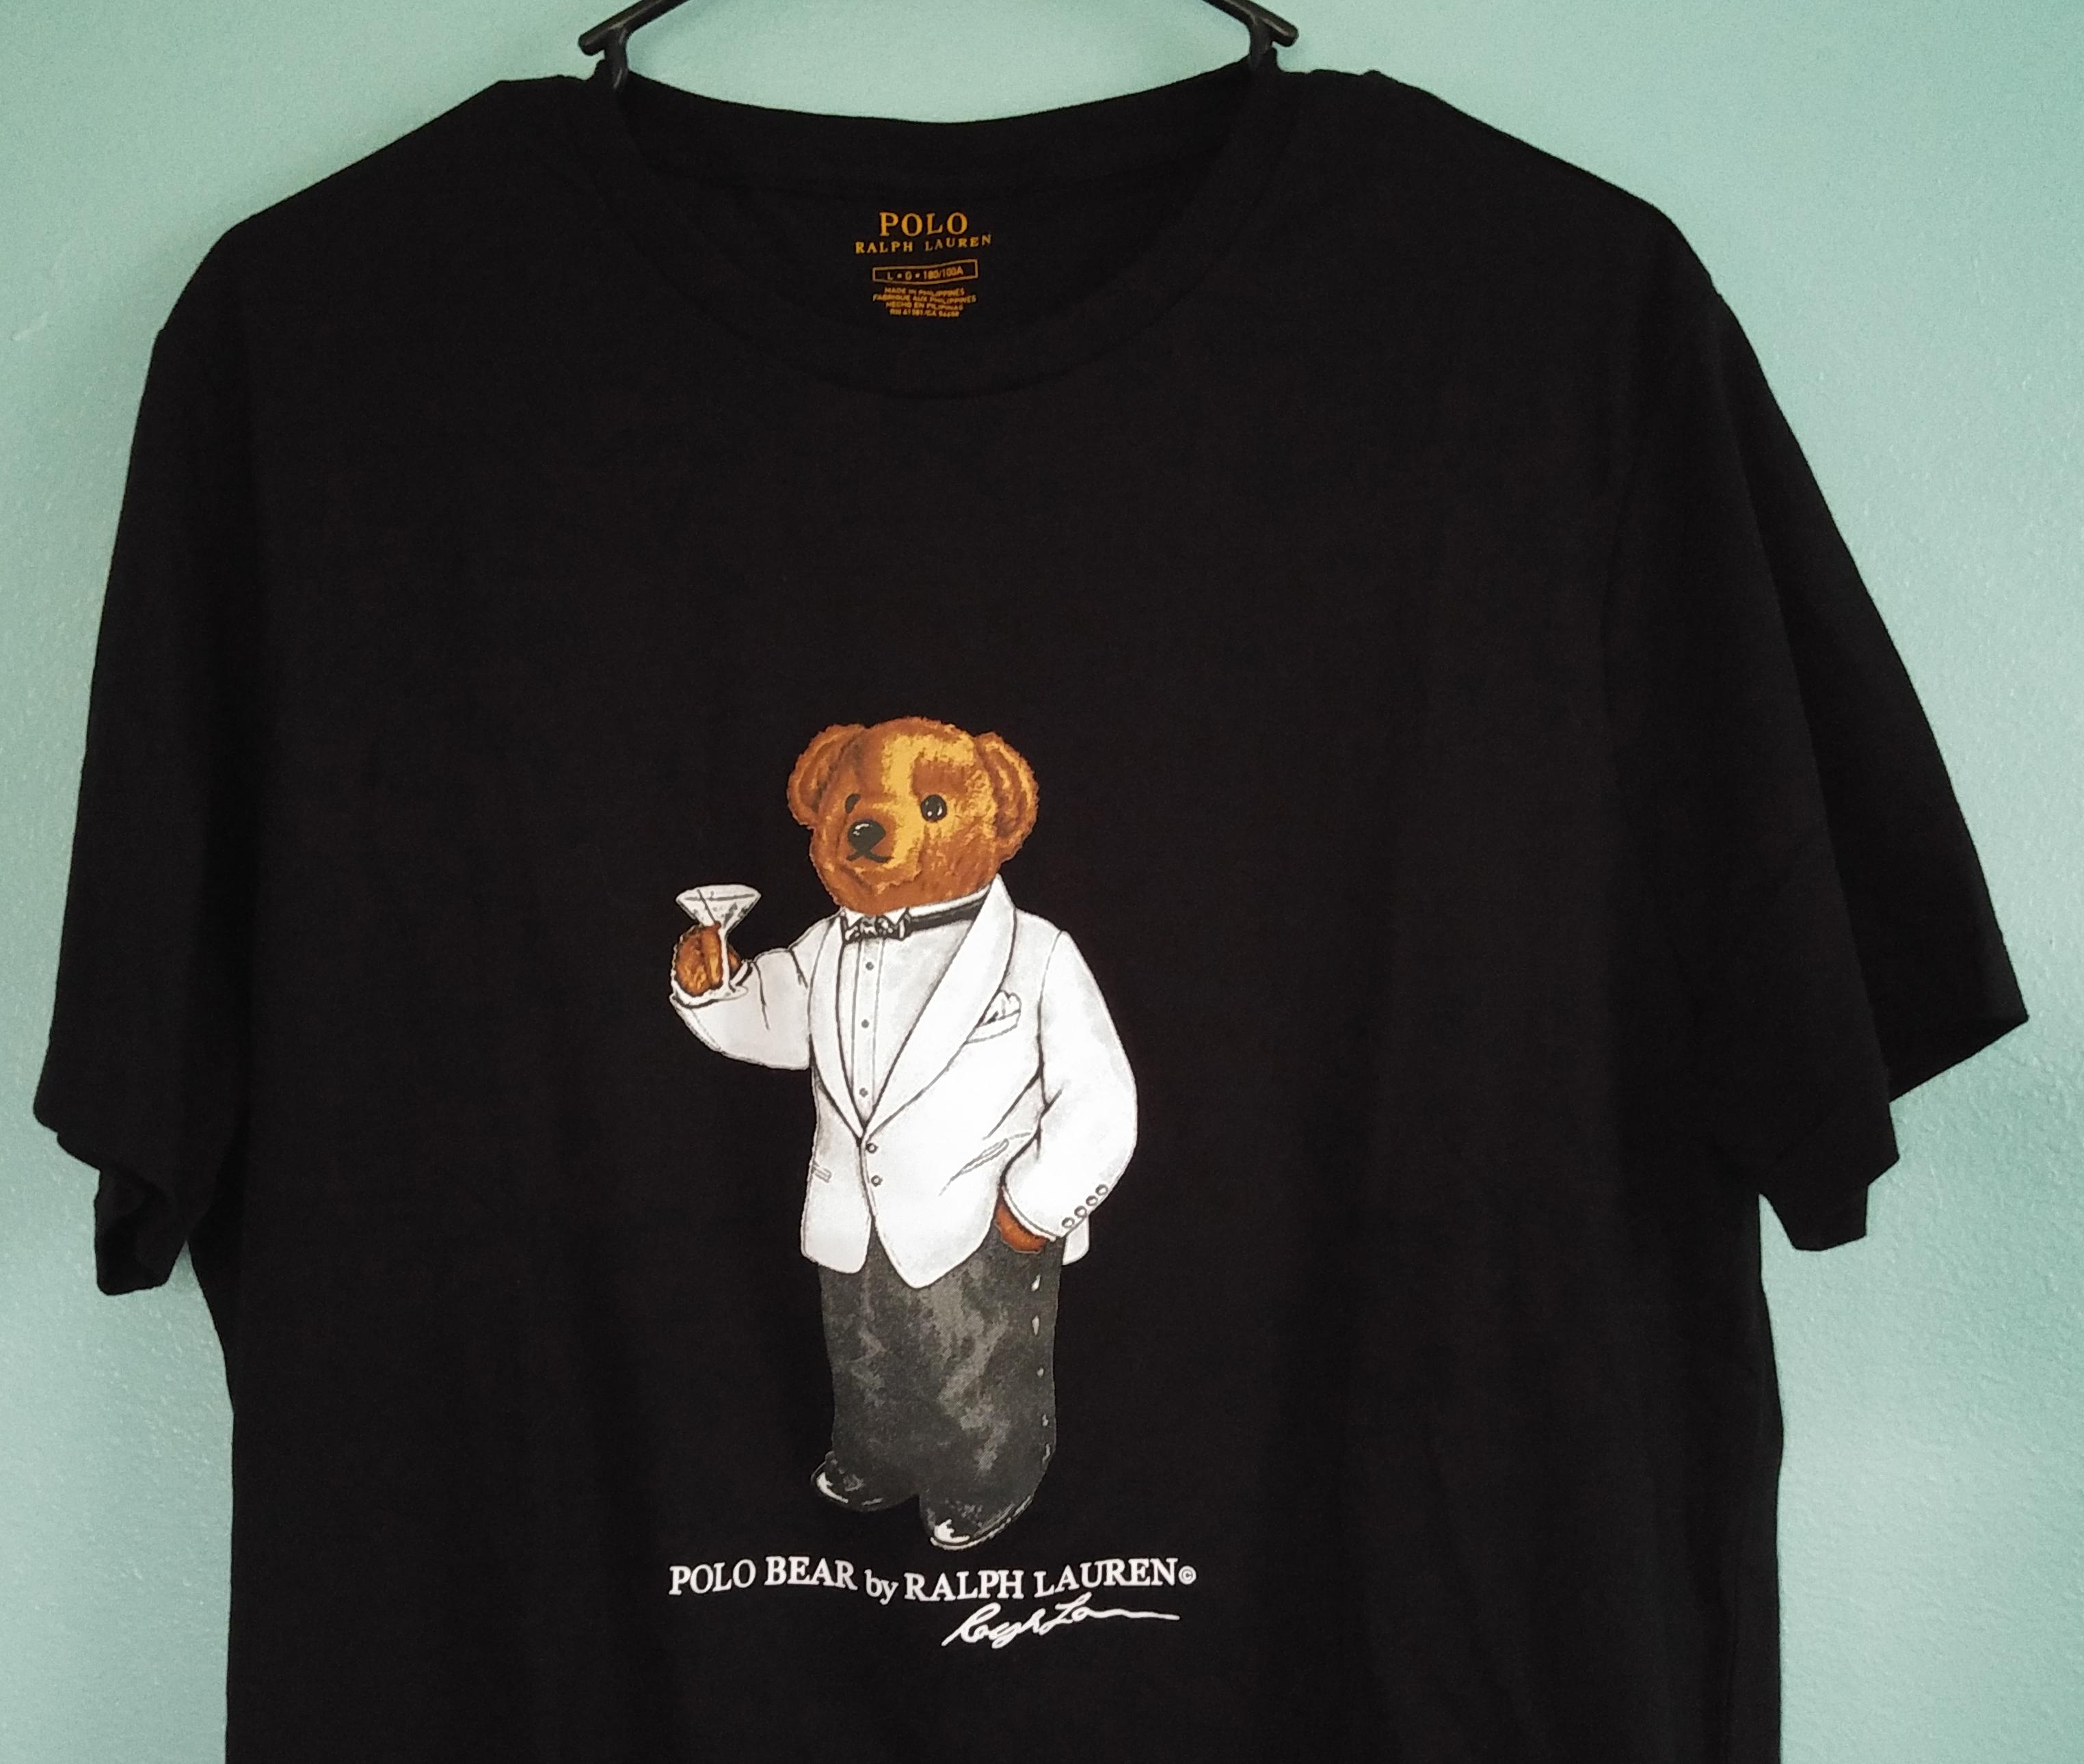 af8ebfddb6 Black Short Sleeve Shirt Ralph Lauren